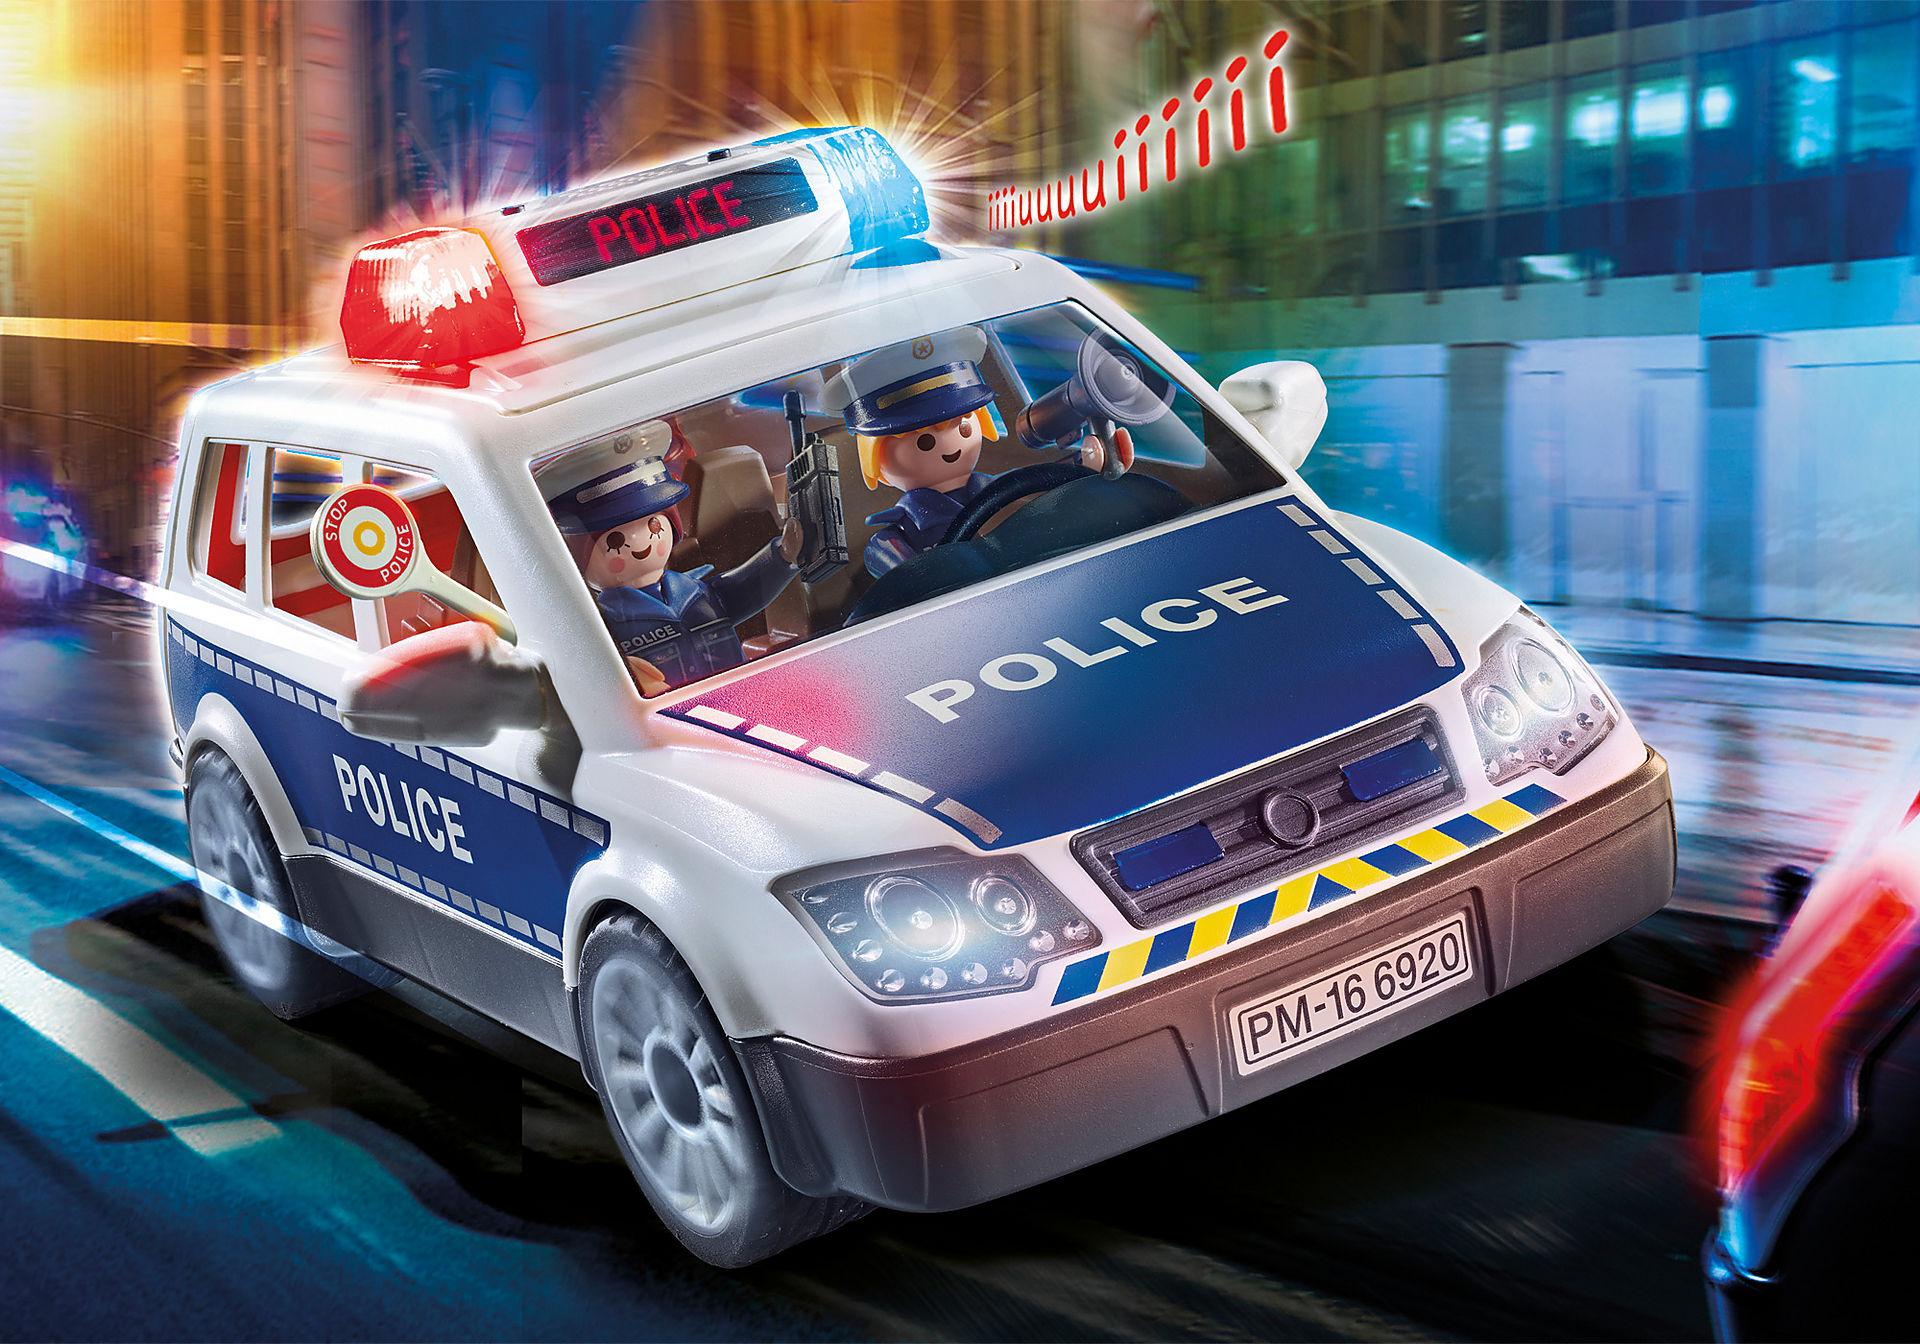 http://media.playmobil.com/i/playmobil/6920_product_detail/Coche de Policía con Luces y Sonido